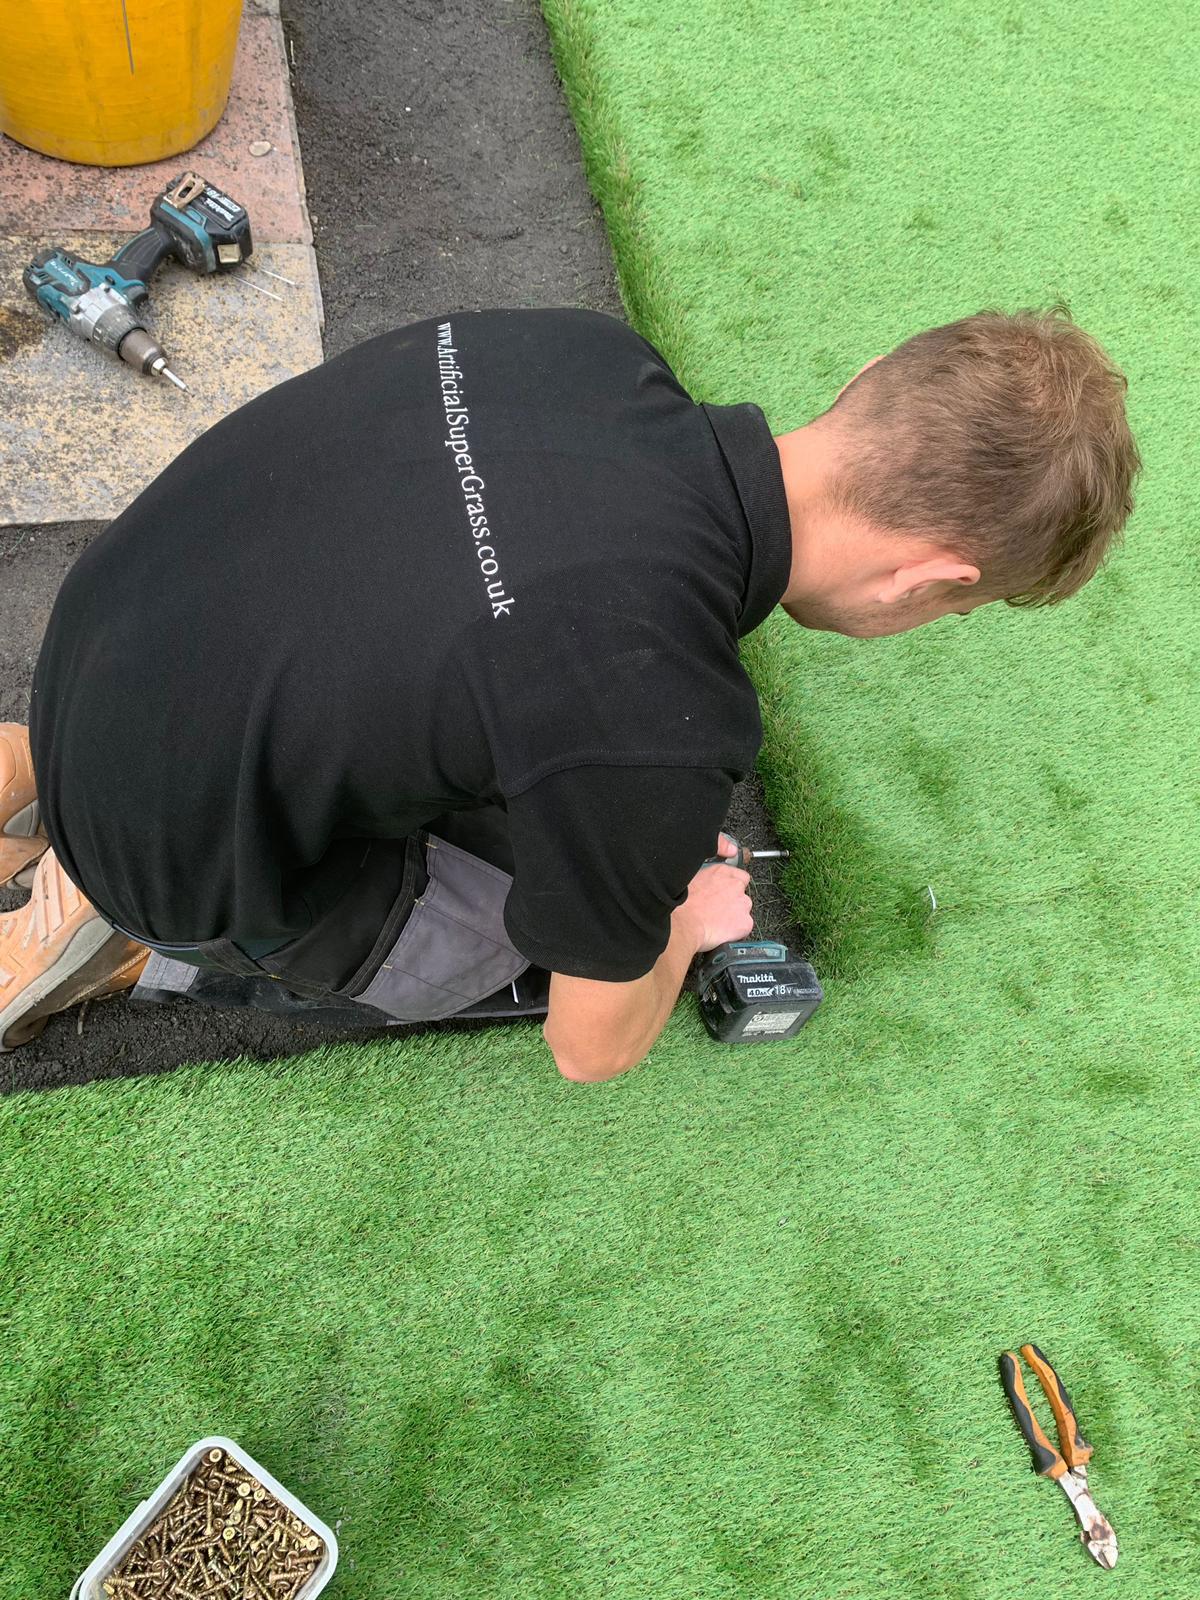 Astro Turf Morley Artificial Super Grass